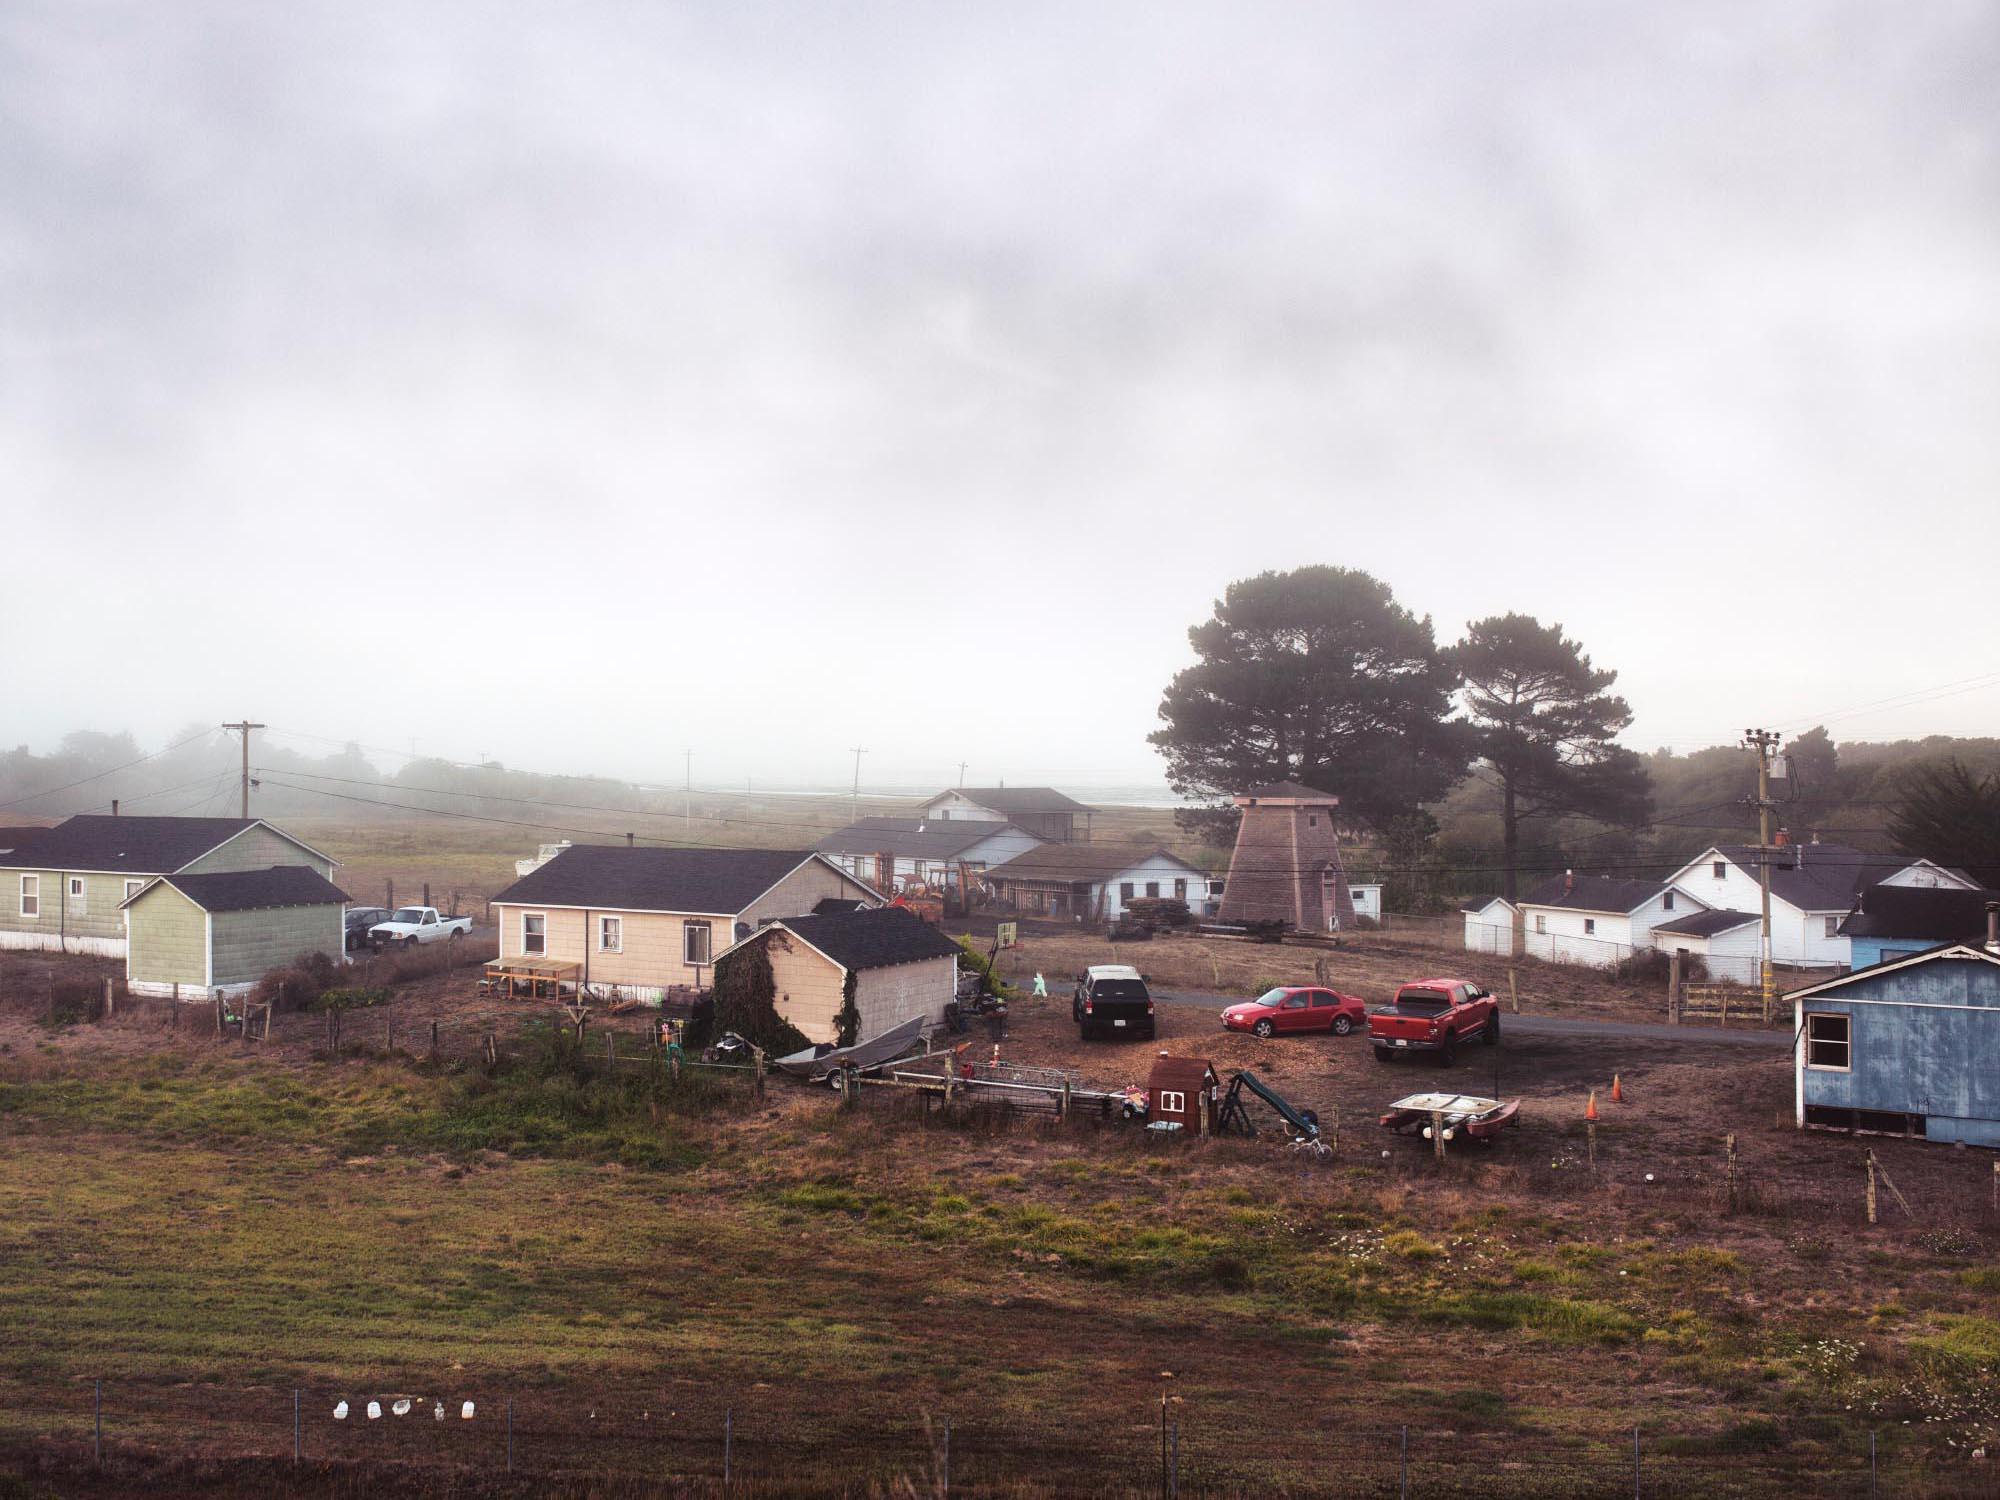 Foggy morning in Samoa, California.